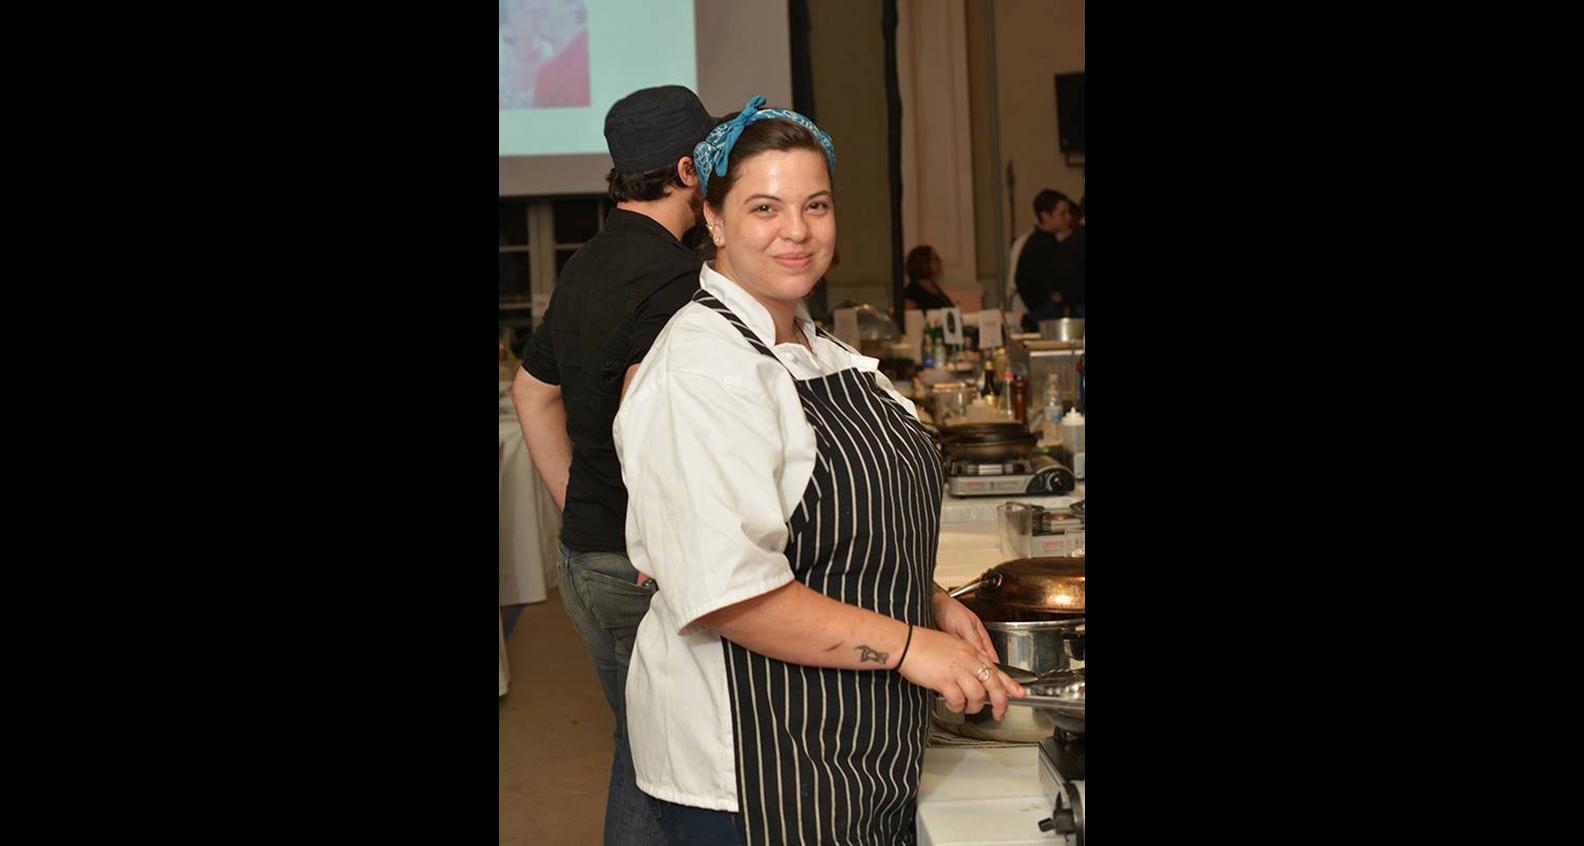 Chef Sarah Acconcia